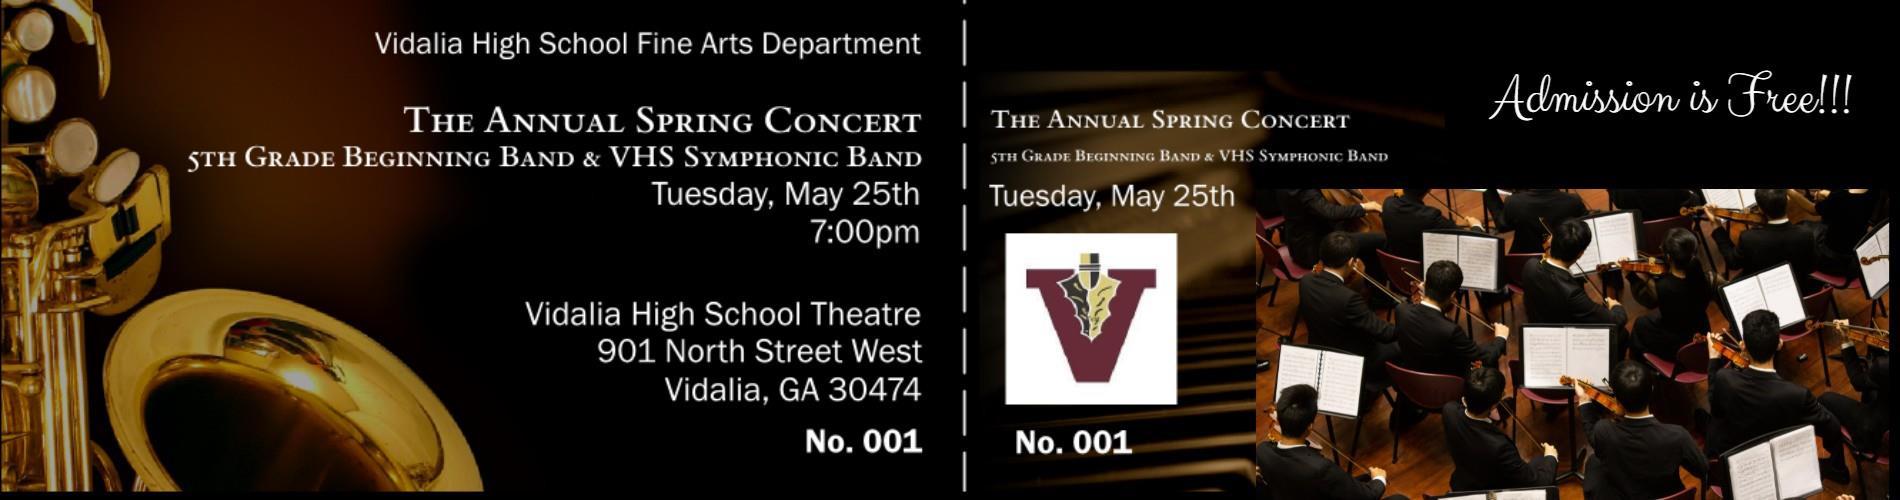 Spring Concert Announcement